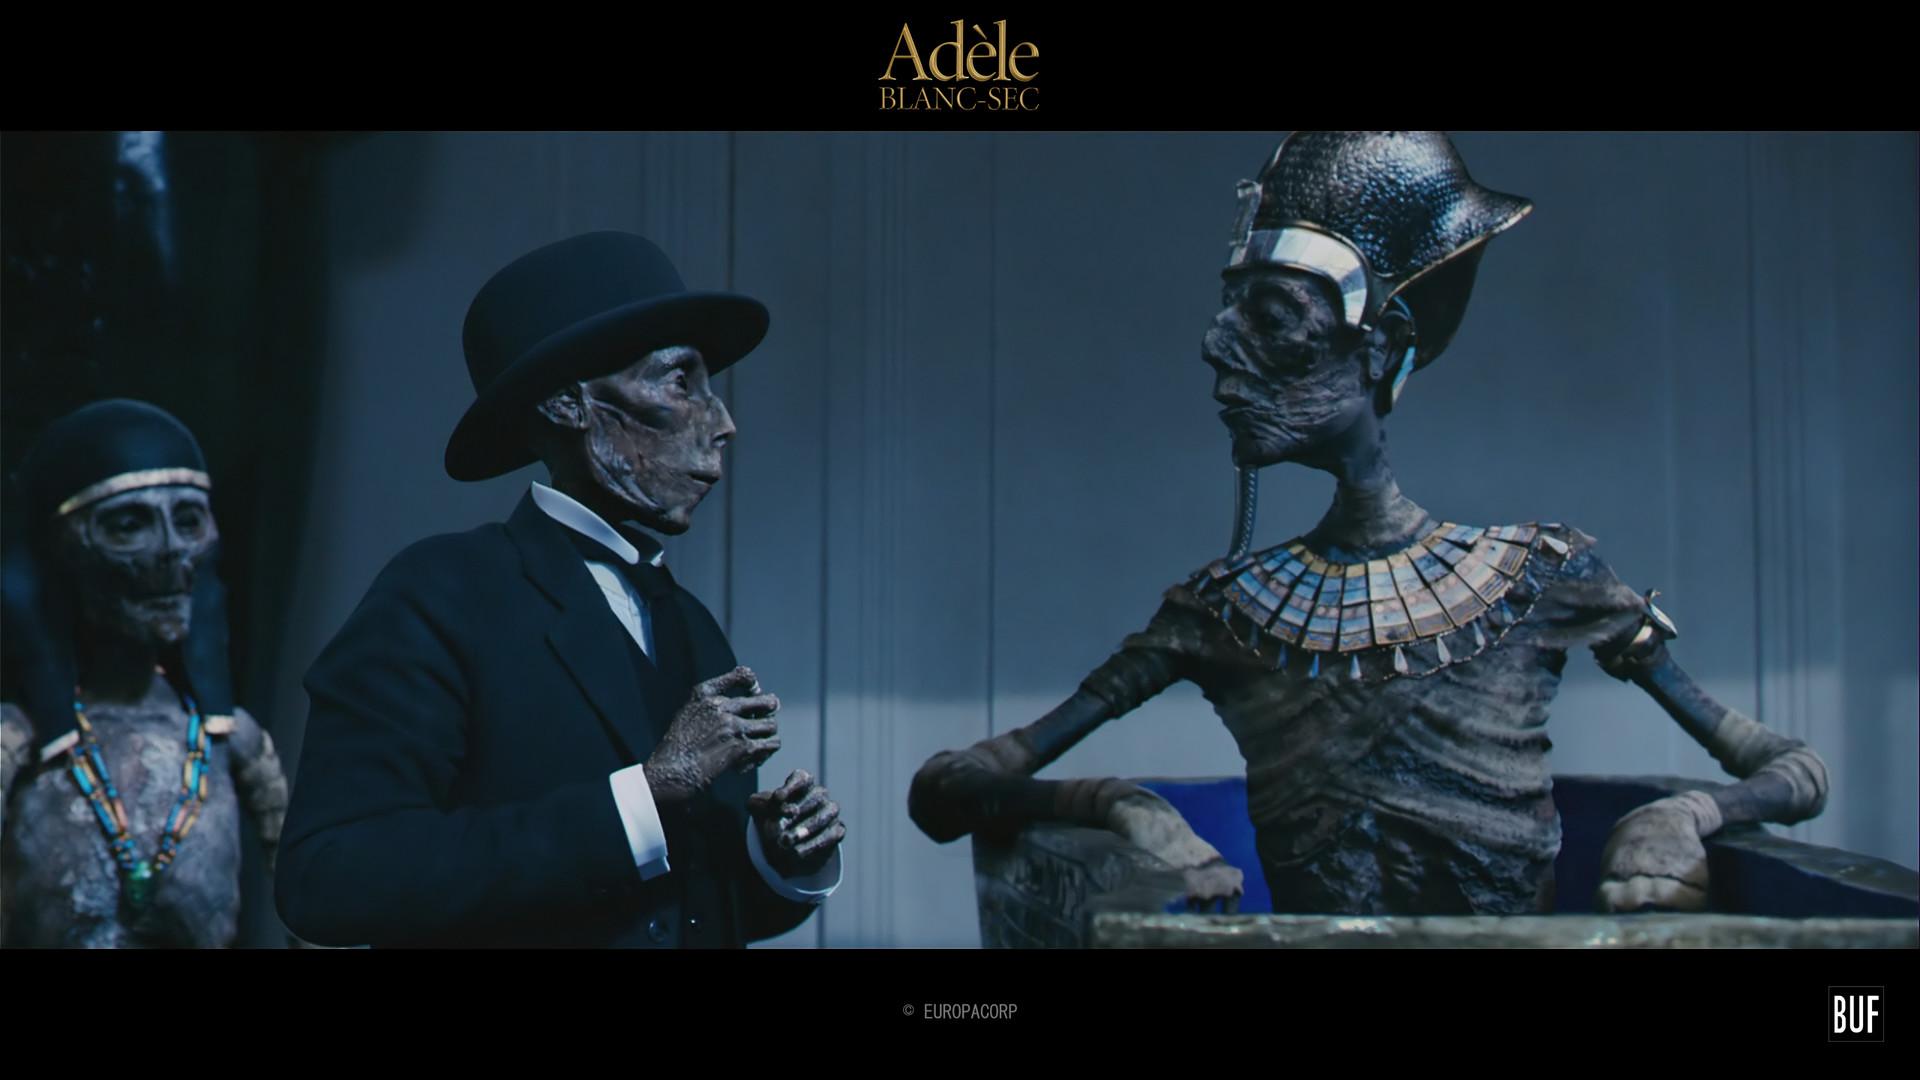 Nicolas boulaire seq mummy louvre 003